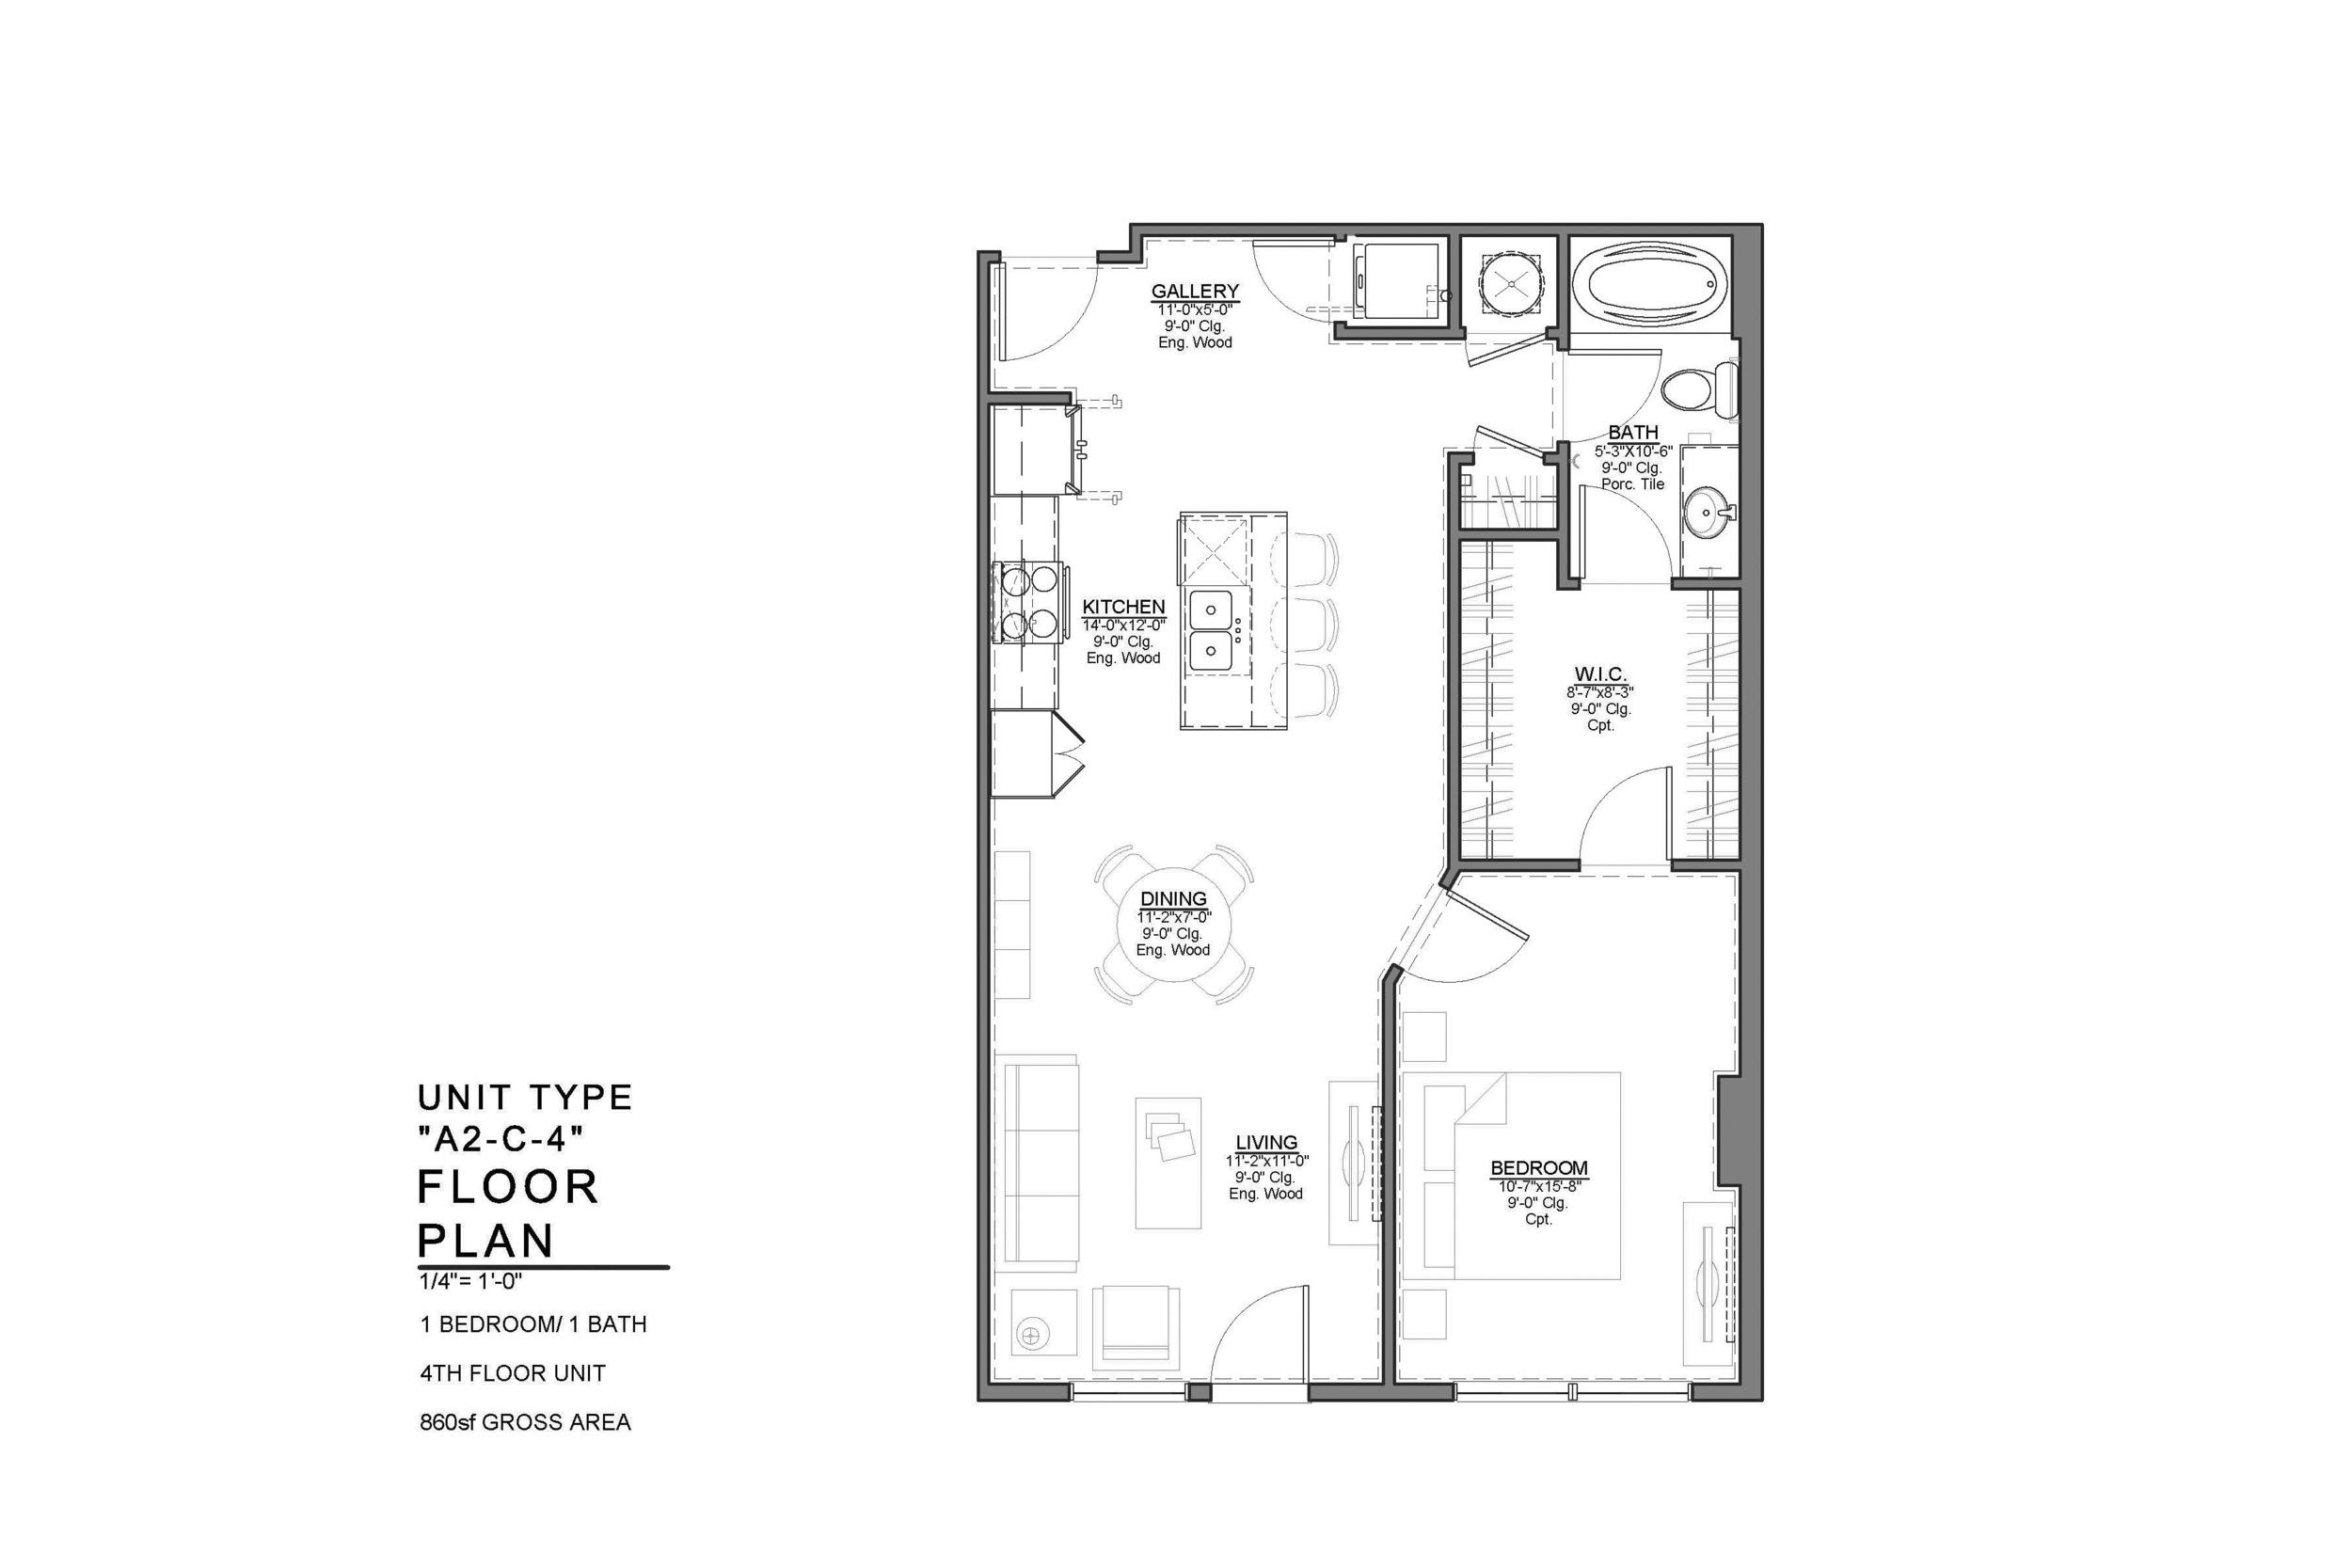 A2-C-4 FLOOR PLAN: 1 BEDROOM / 1 BATH